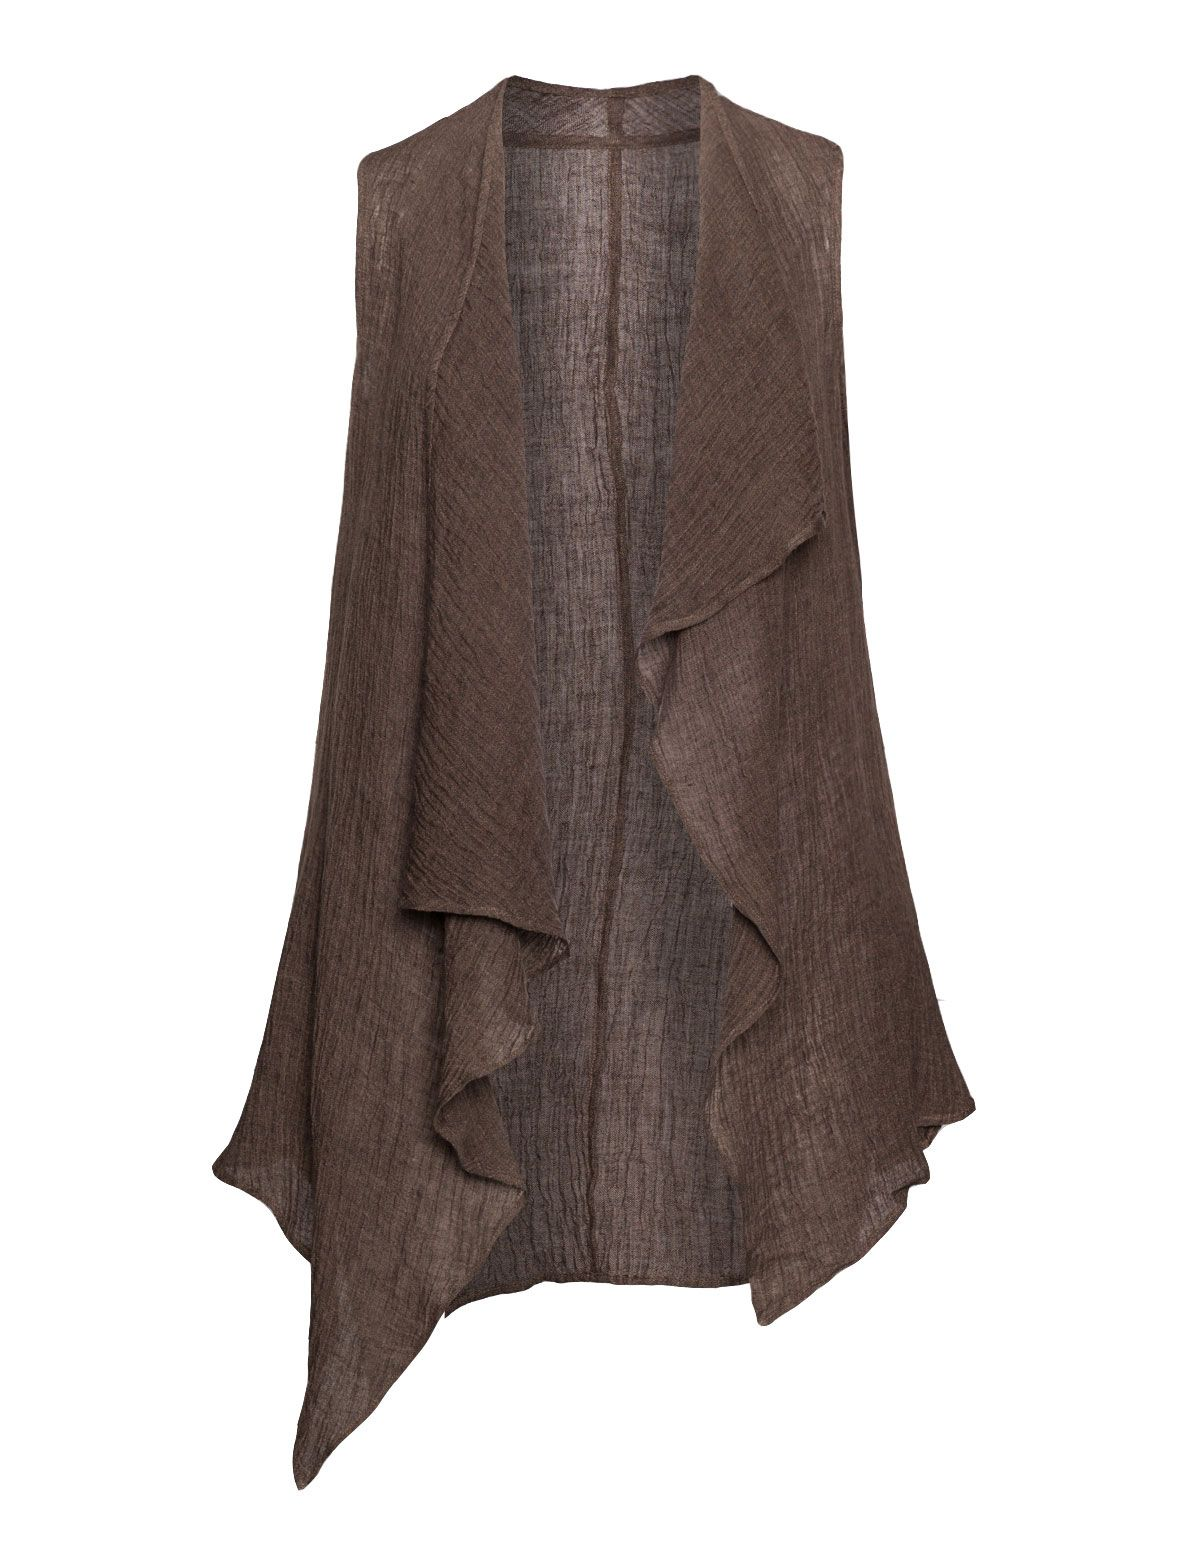 ISOLDE ROTH - Linen sleeveless cardigan - navabi | cardigans ...